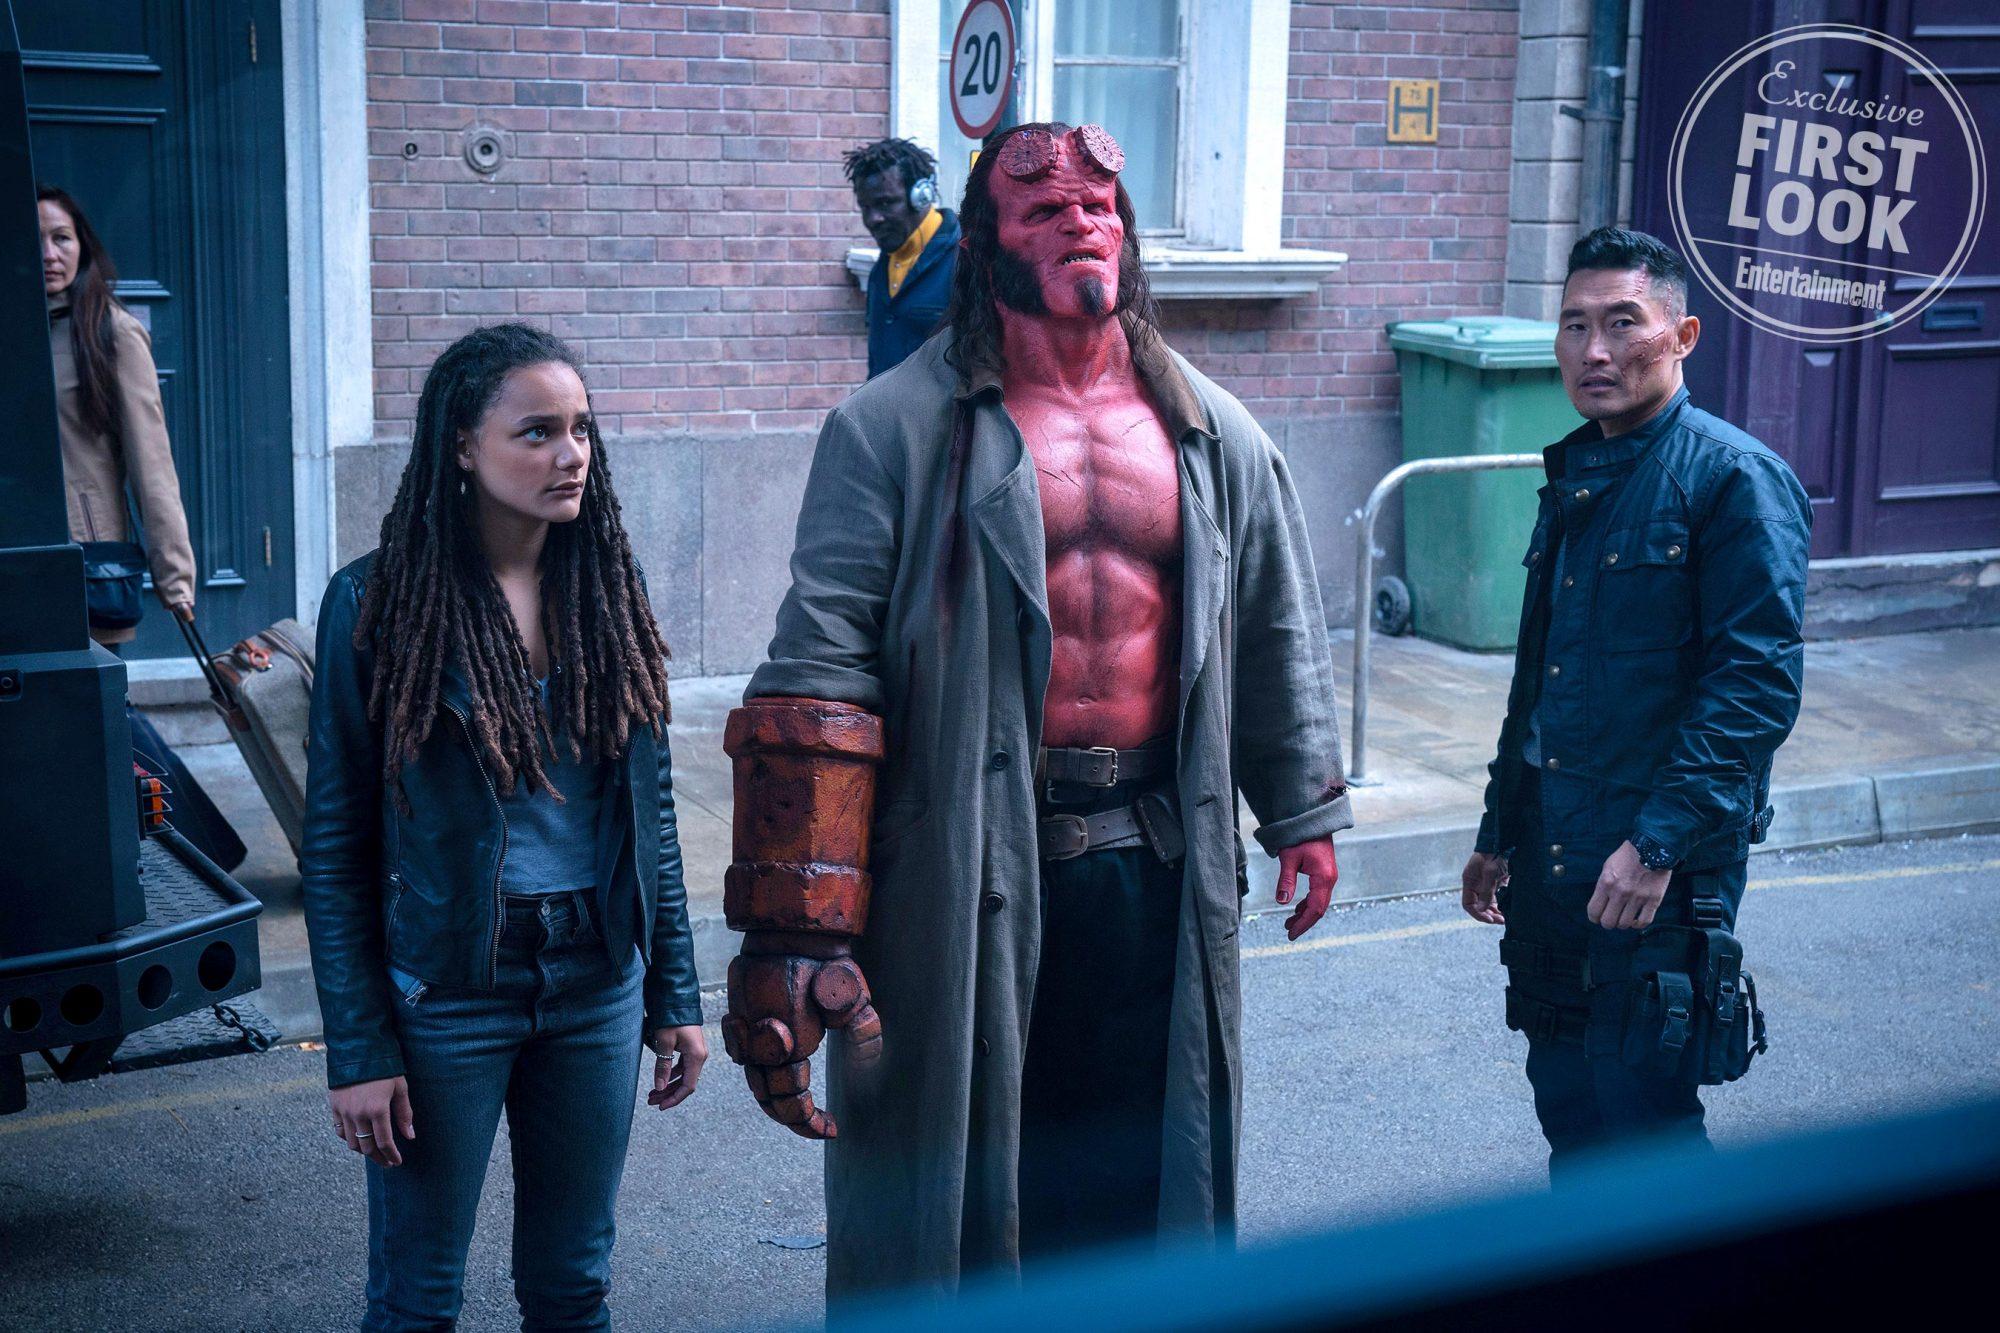 HellboySasha Lane, David Harbour, and Daniel Dae Kim